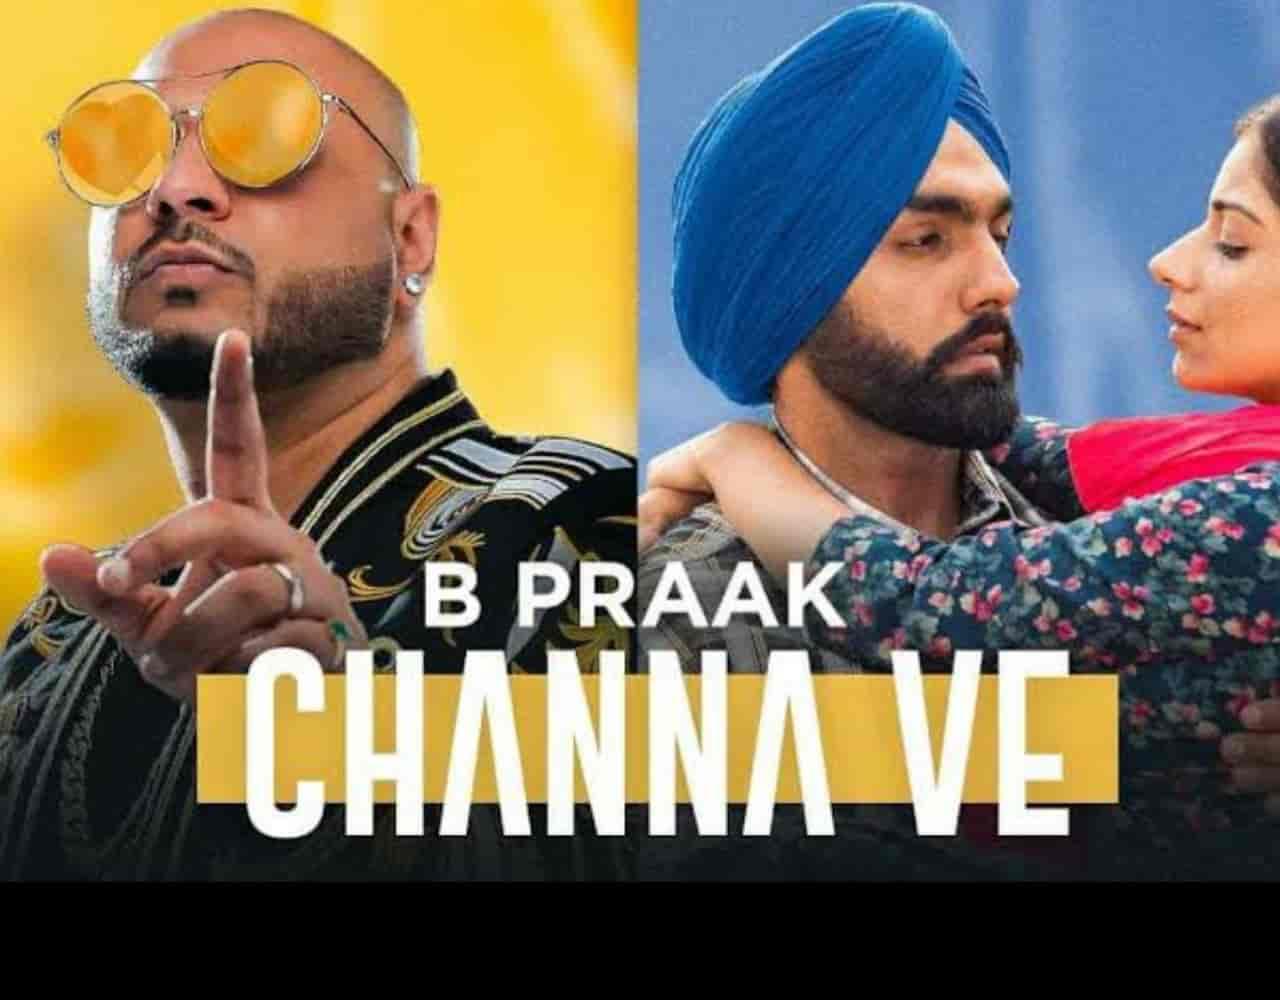 Channa Ve Punjabi Love Song Lyrics, Sung By B Praak